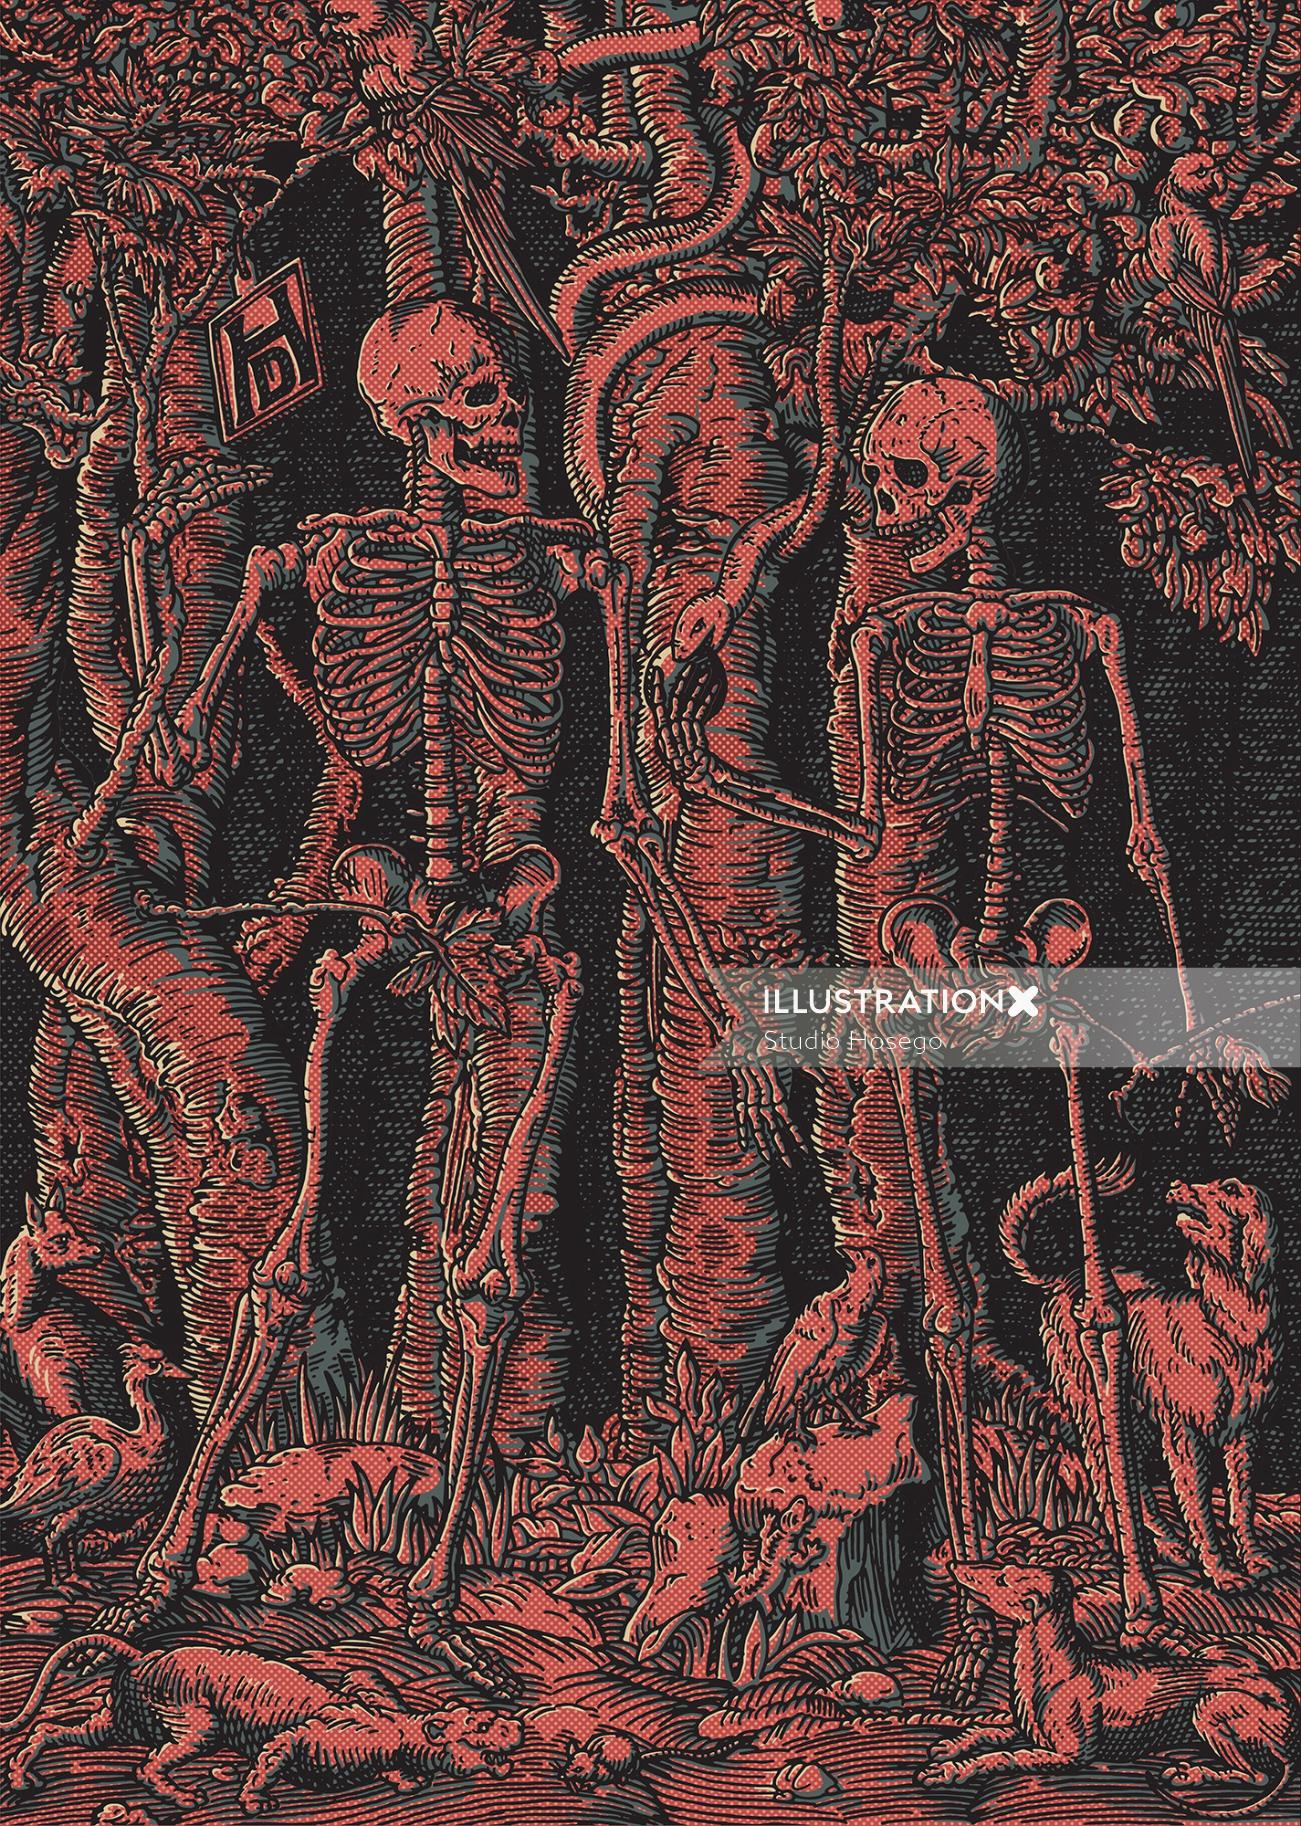 Jake and dinos brothers skull illustration